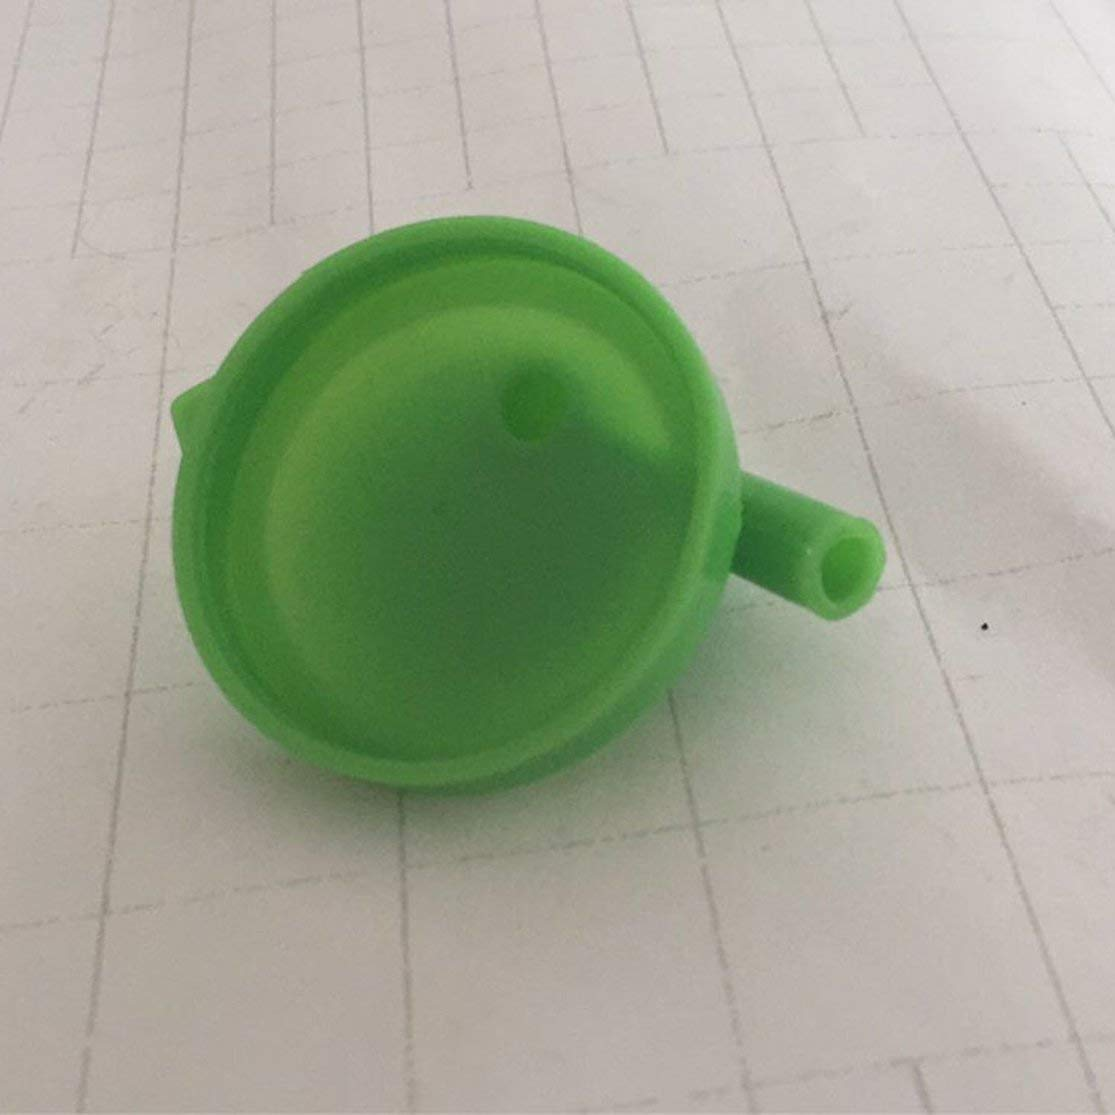 LouiseEvel215 Green Car Engine Radiator Expansion Coolant Coolant Bottle for Suzuki Swift